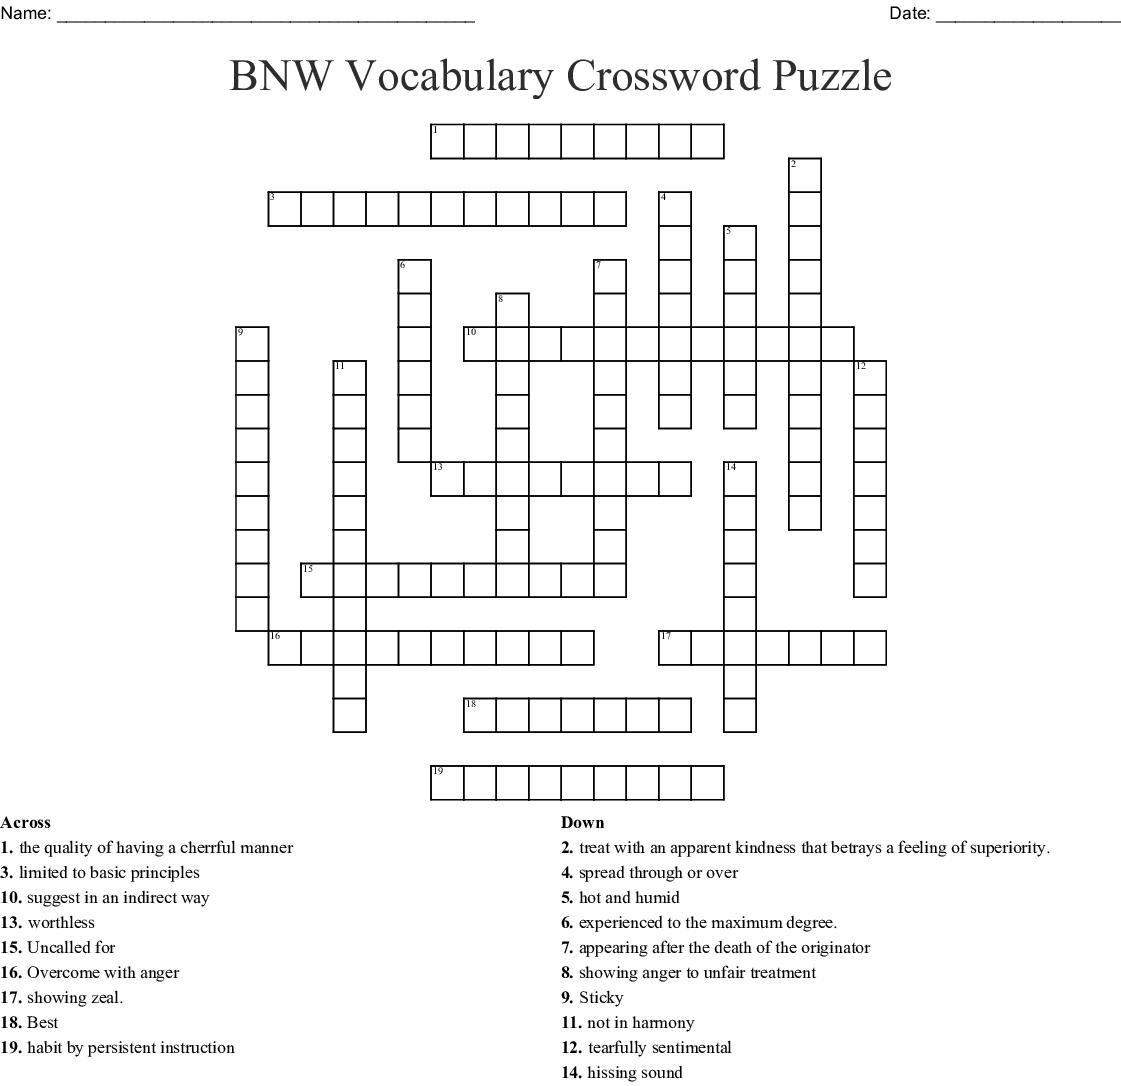 BNW Vocabulary Crossword Puzzle Crossword - WordMint